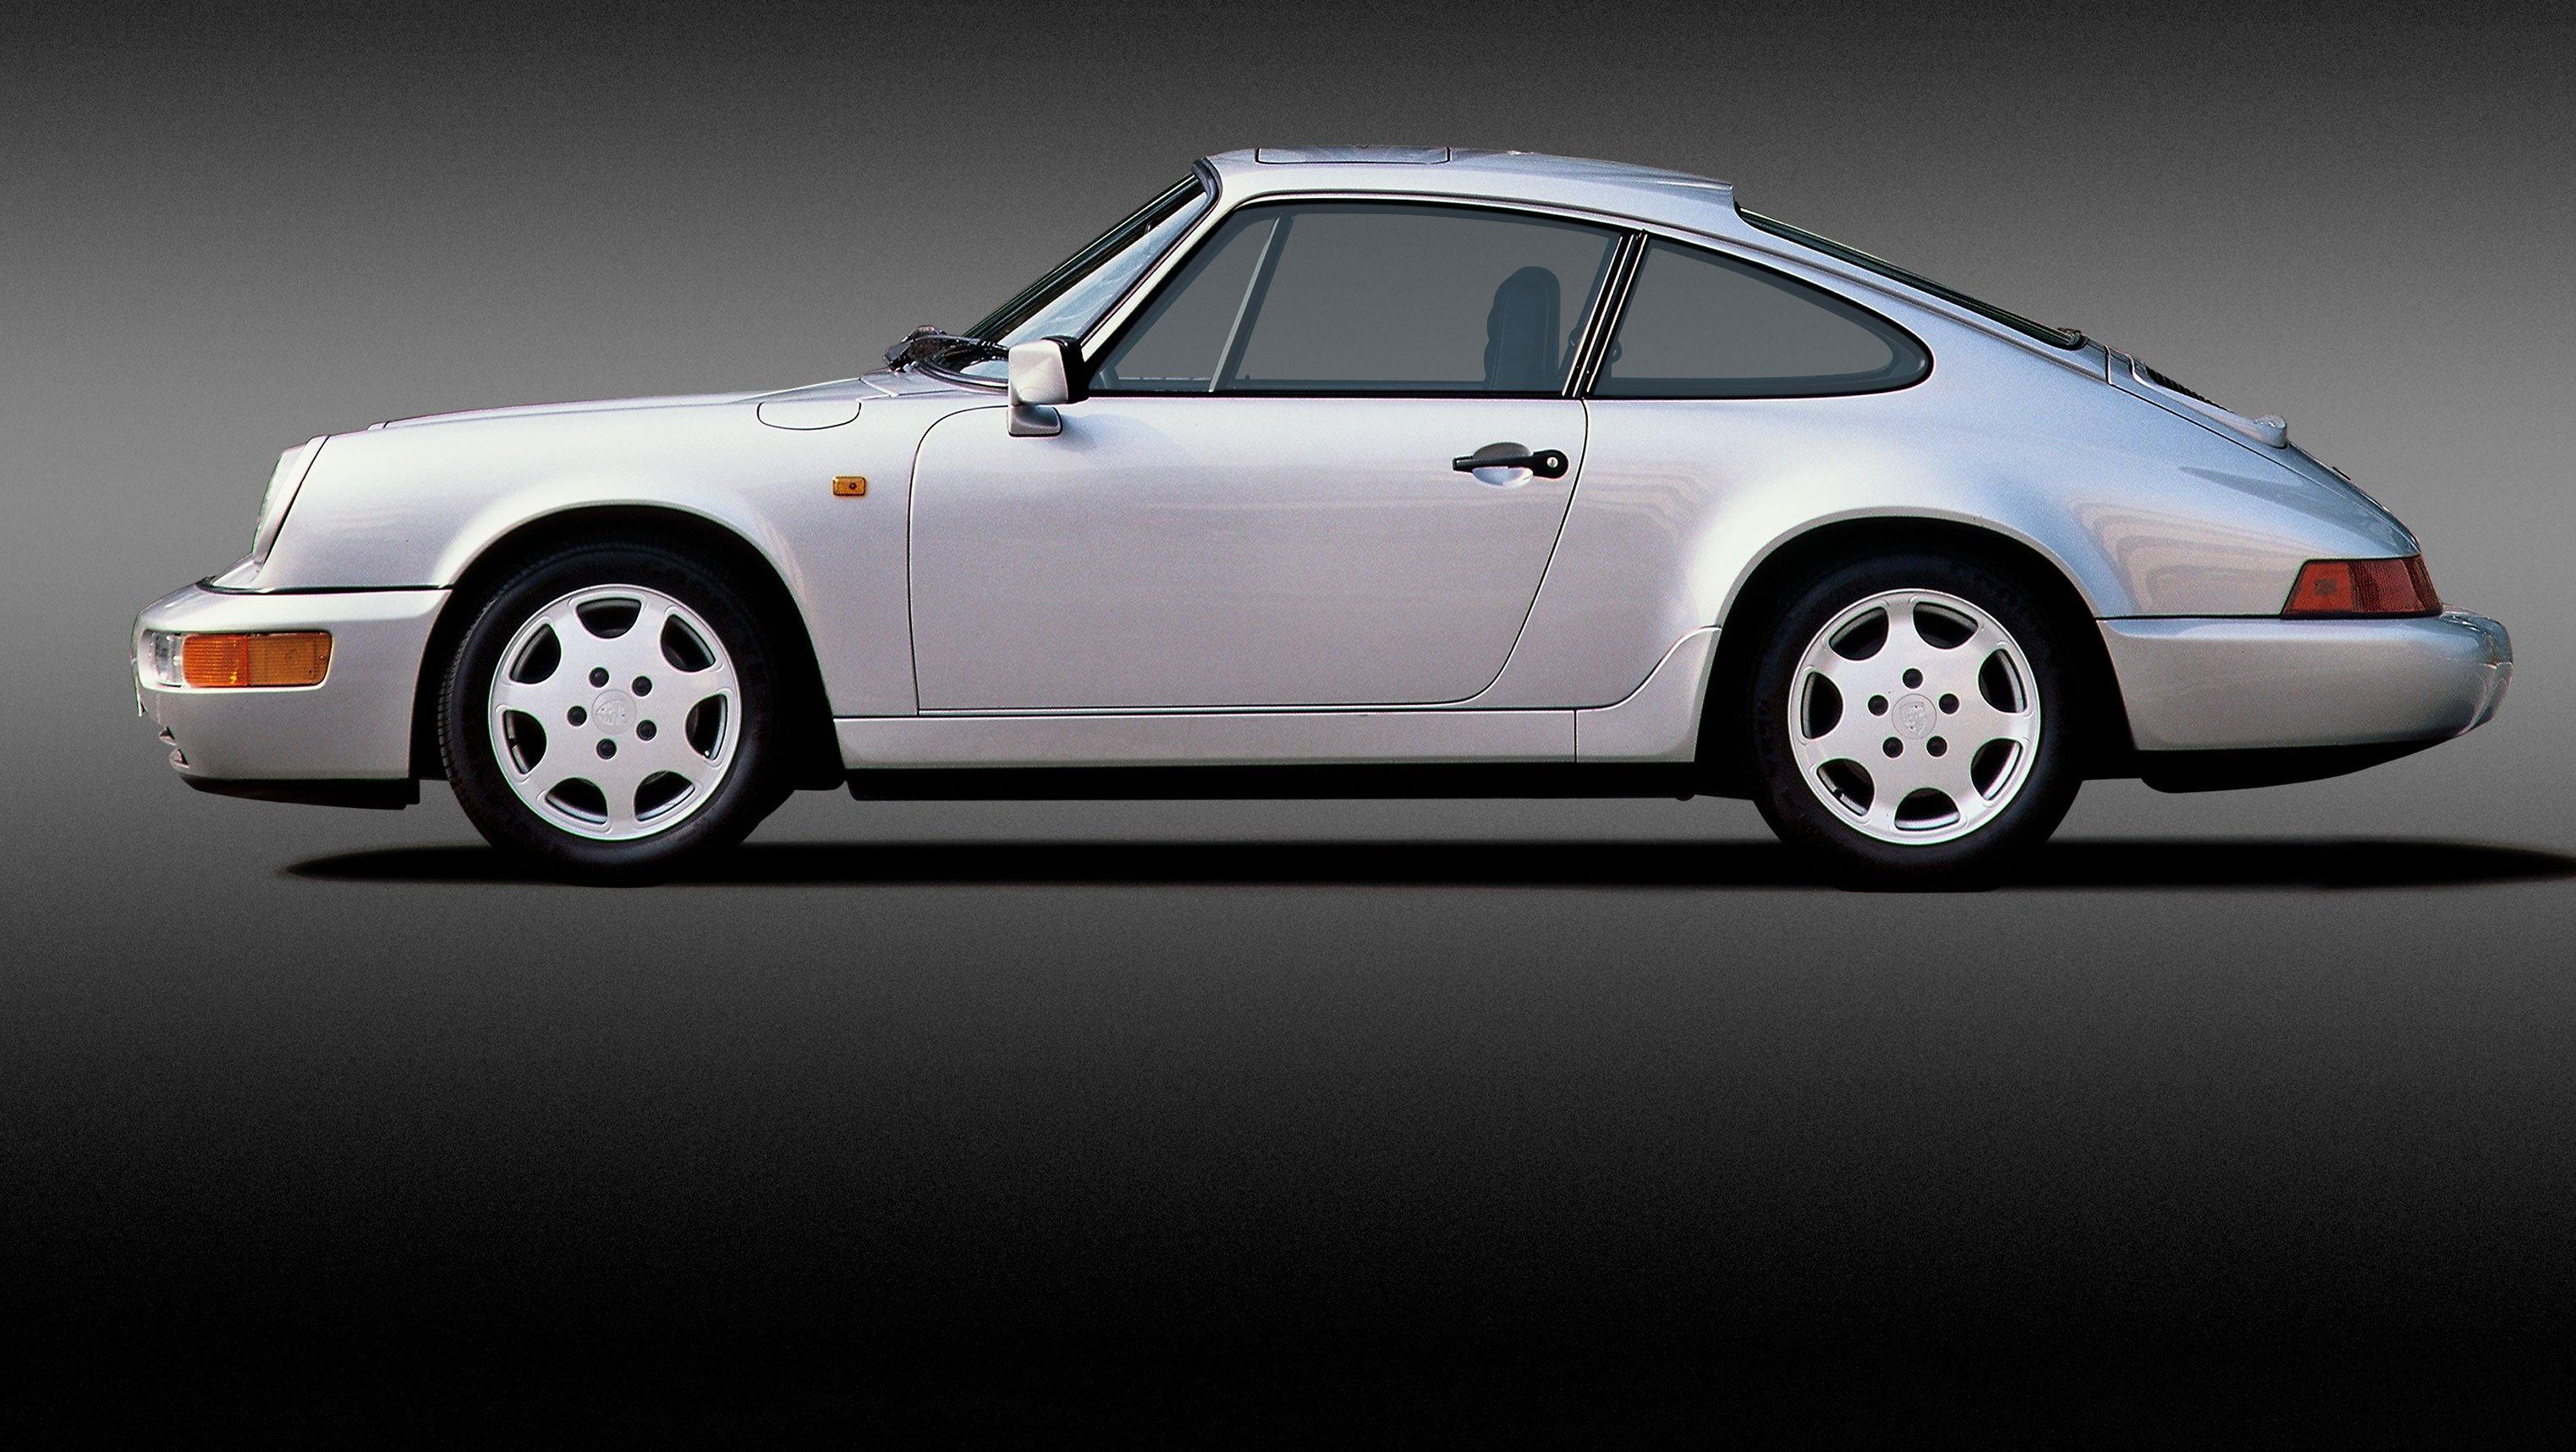 Porsche 911 type 964 3eme génération 1988 1994 02